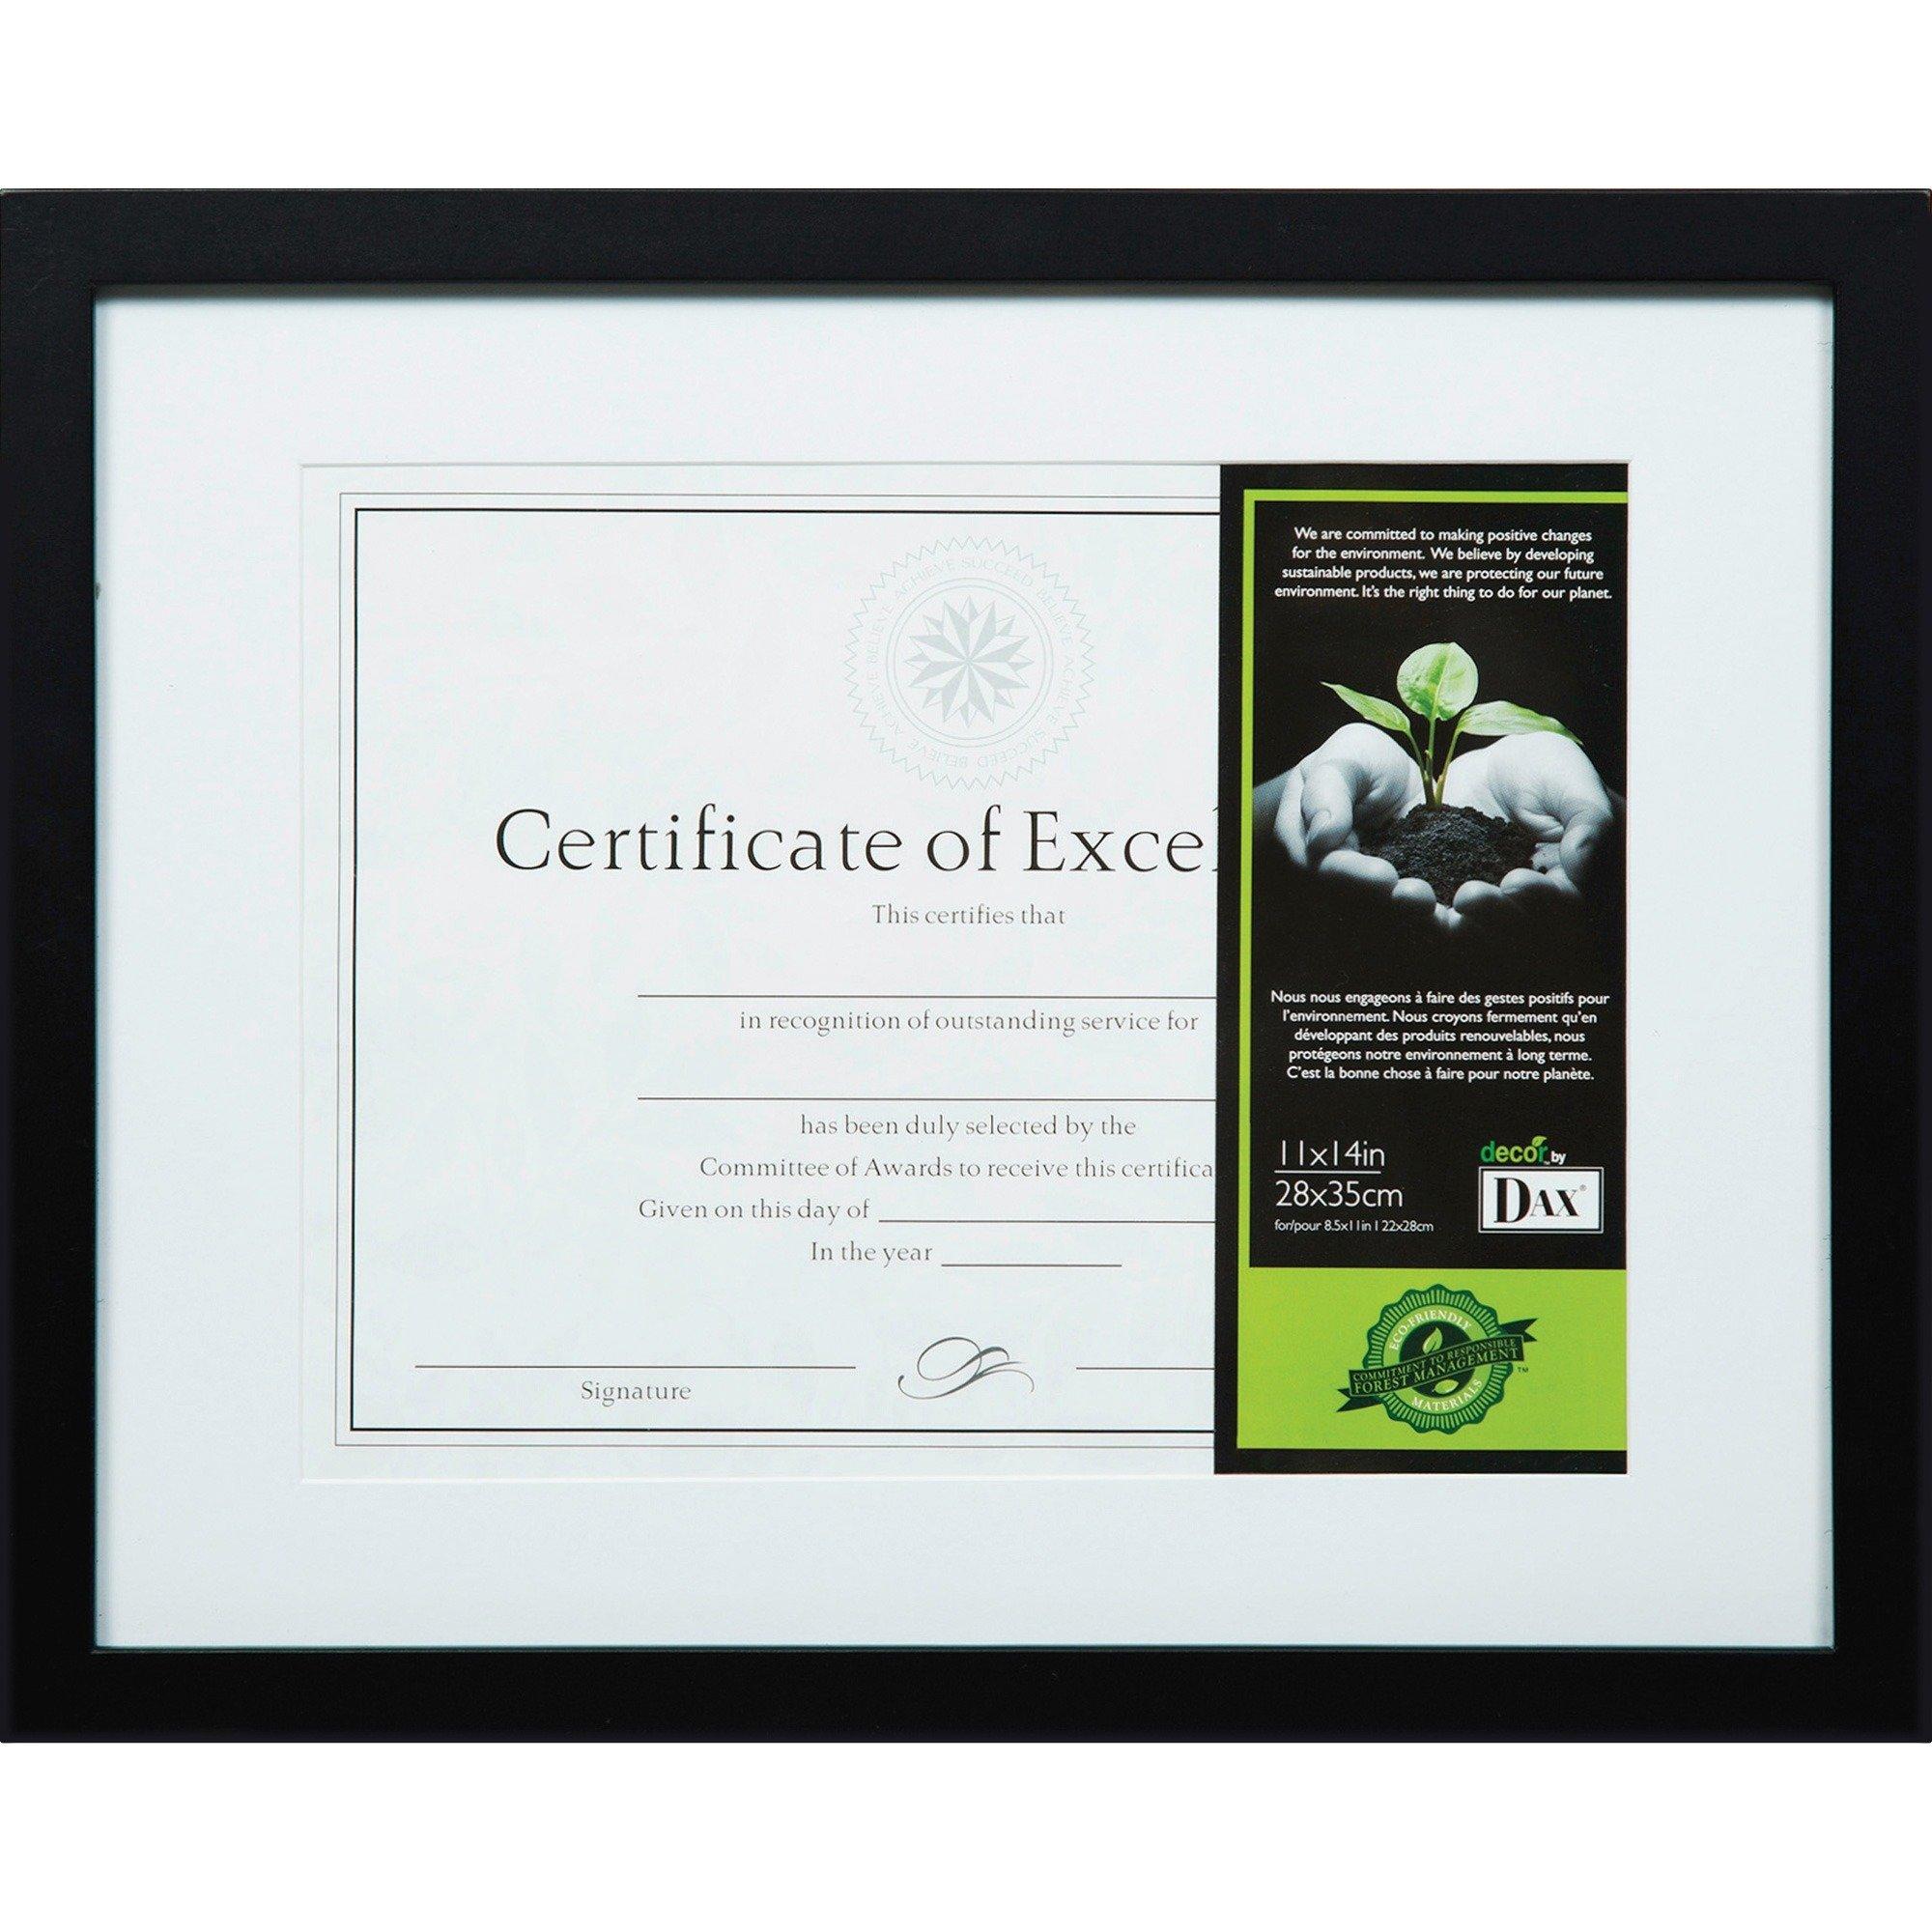 "DAX FSC Certified Black Wooden Frame 11"" Width x 14"" Height"